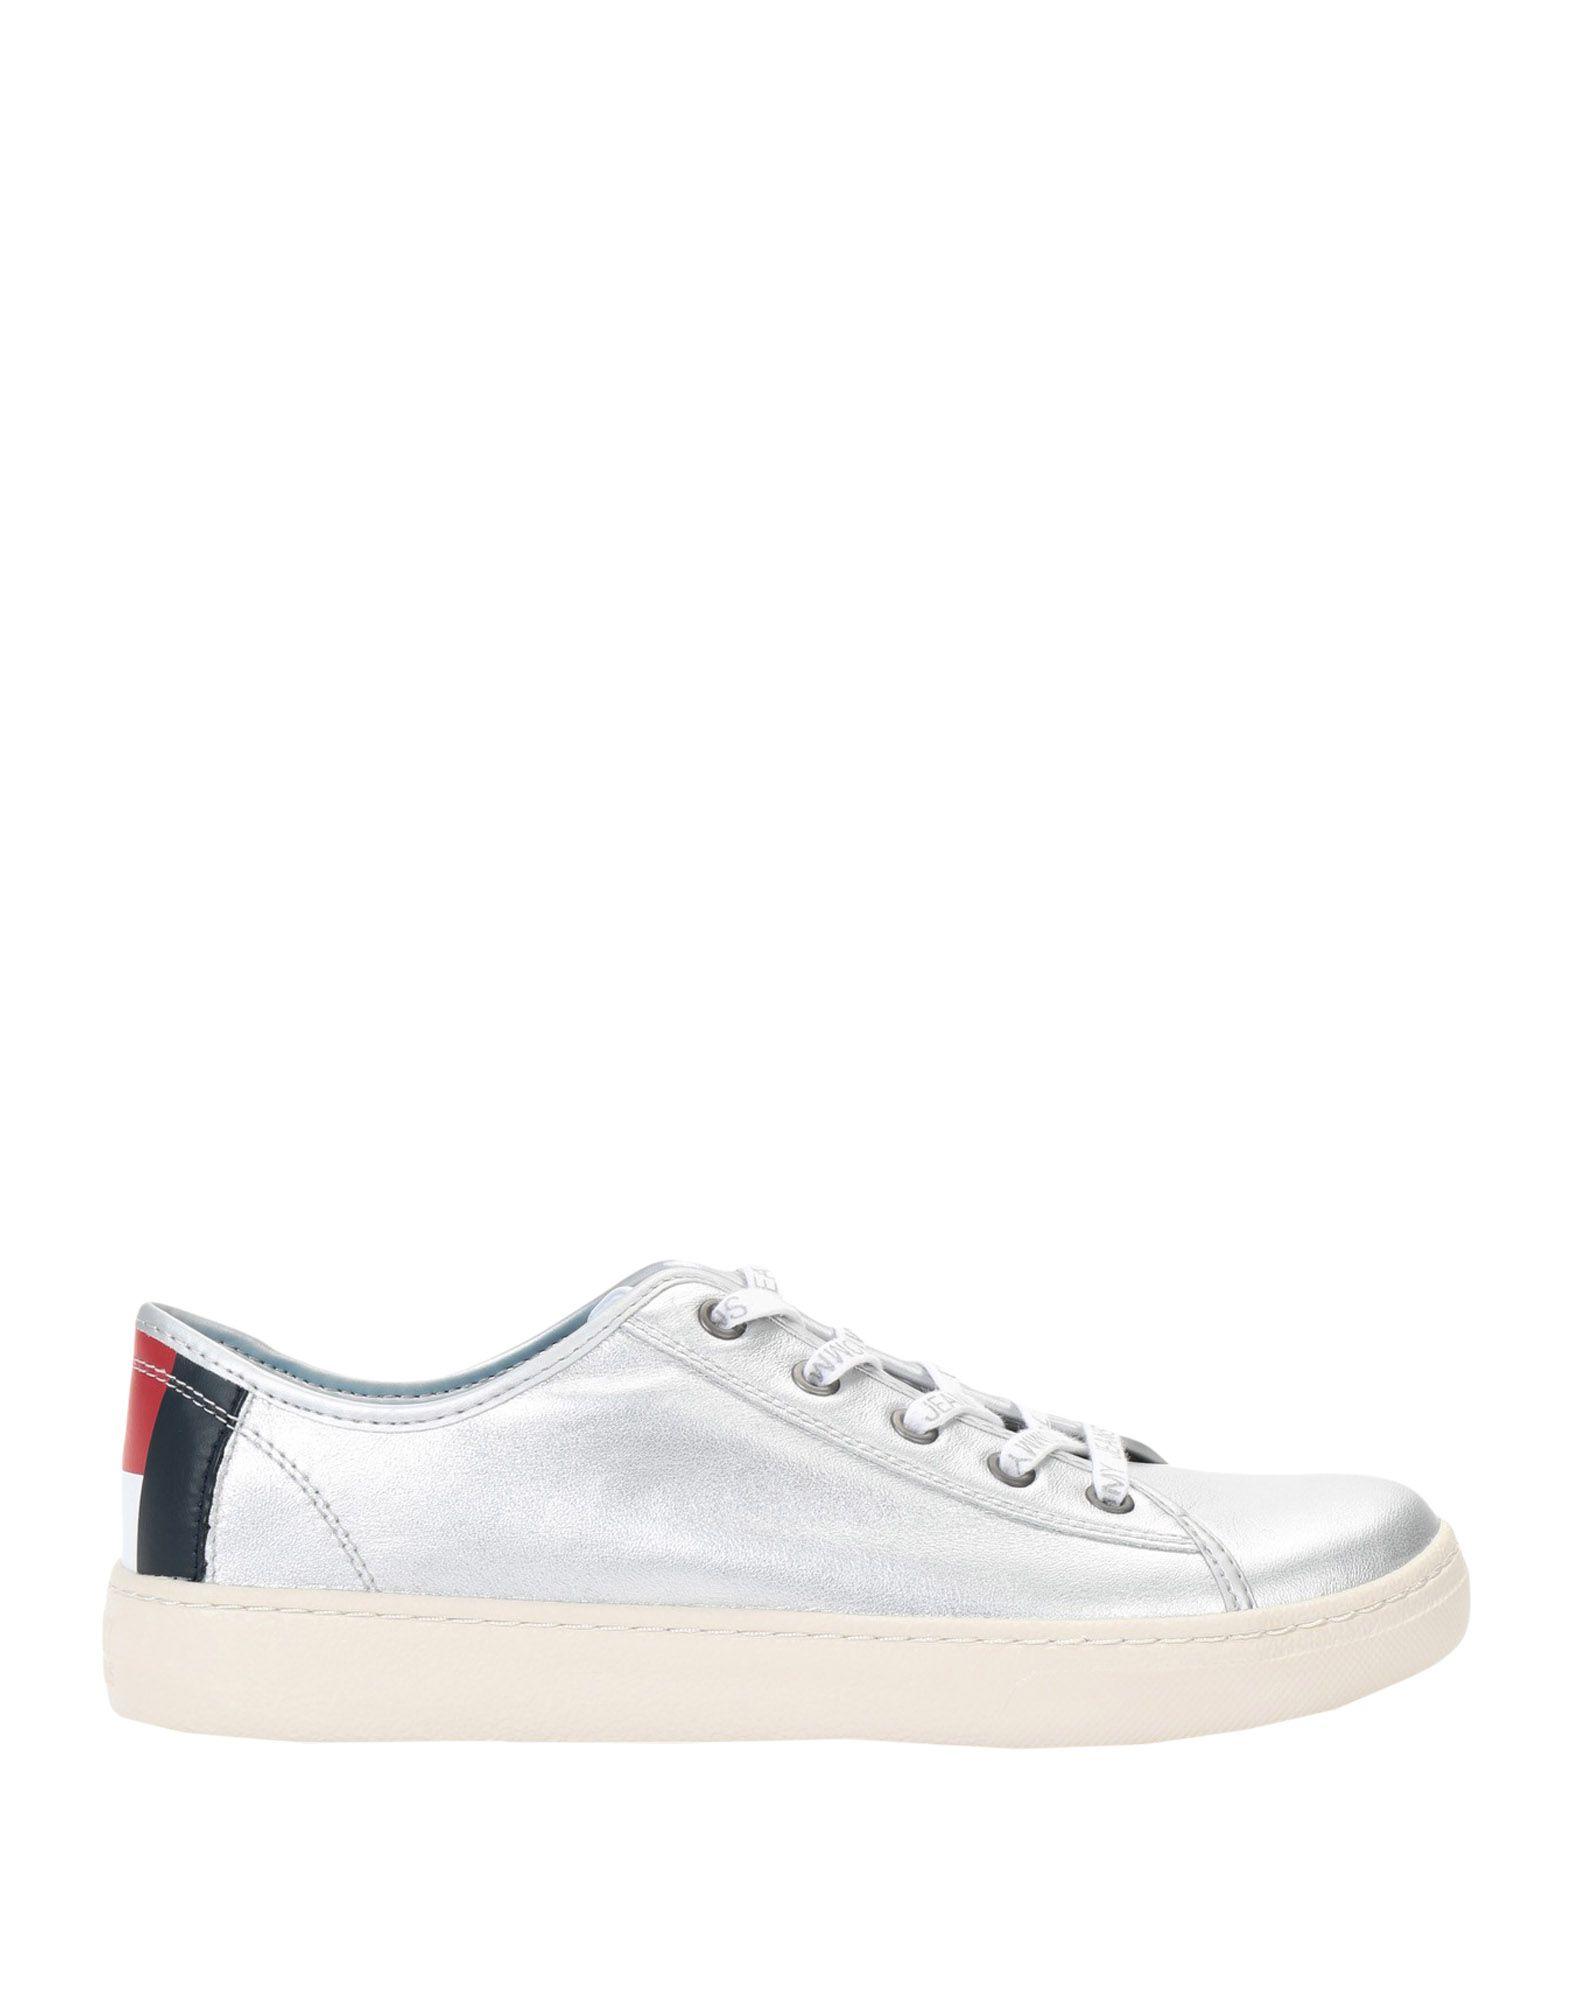 Tommy Jeans Tommy Jeans Light Gute Leather Low  11539733HW Gute Light Qualität beliebte Schuhe bf1b0b